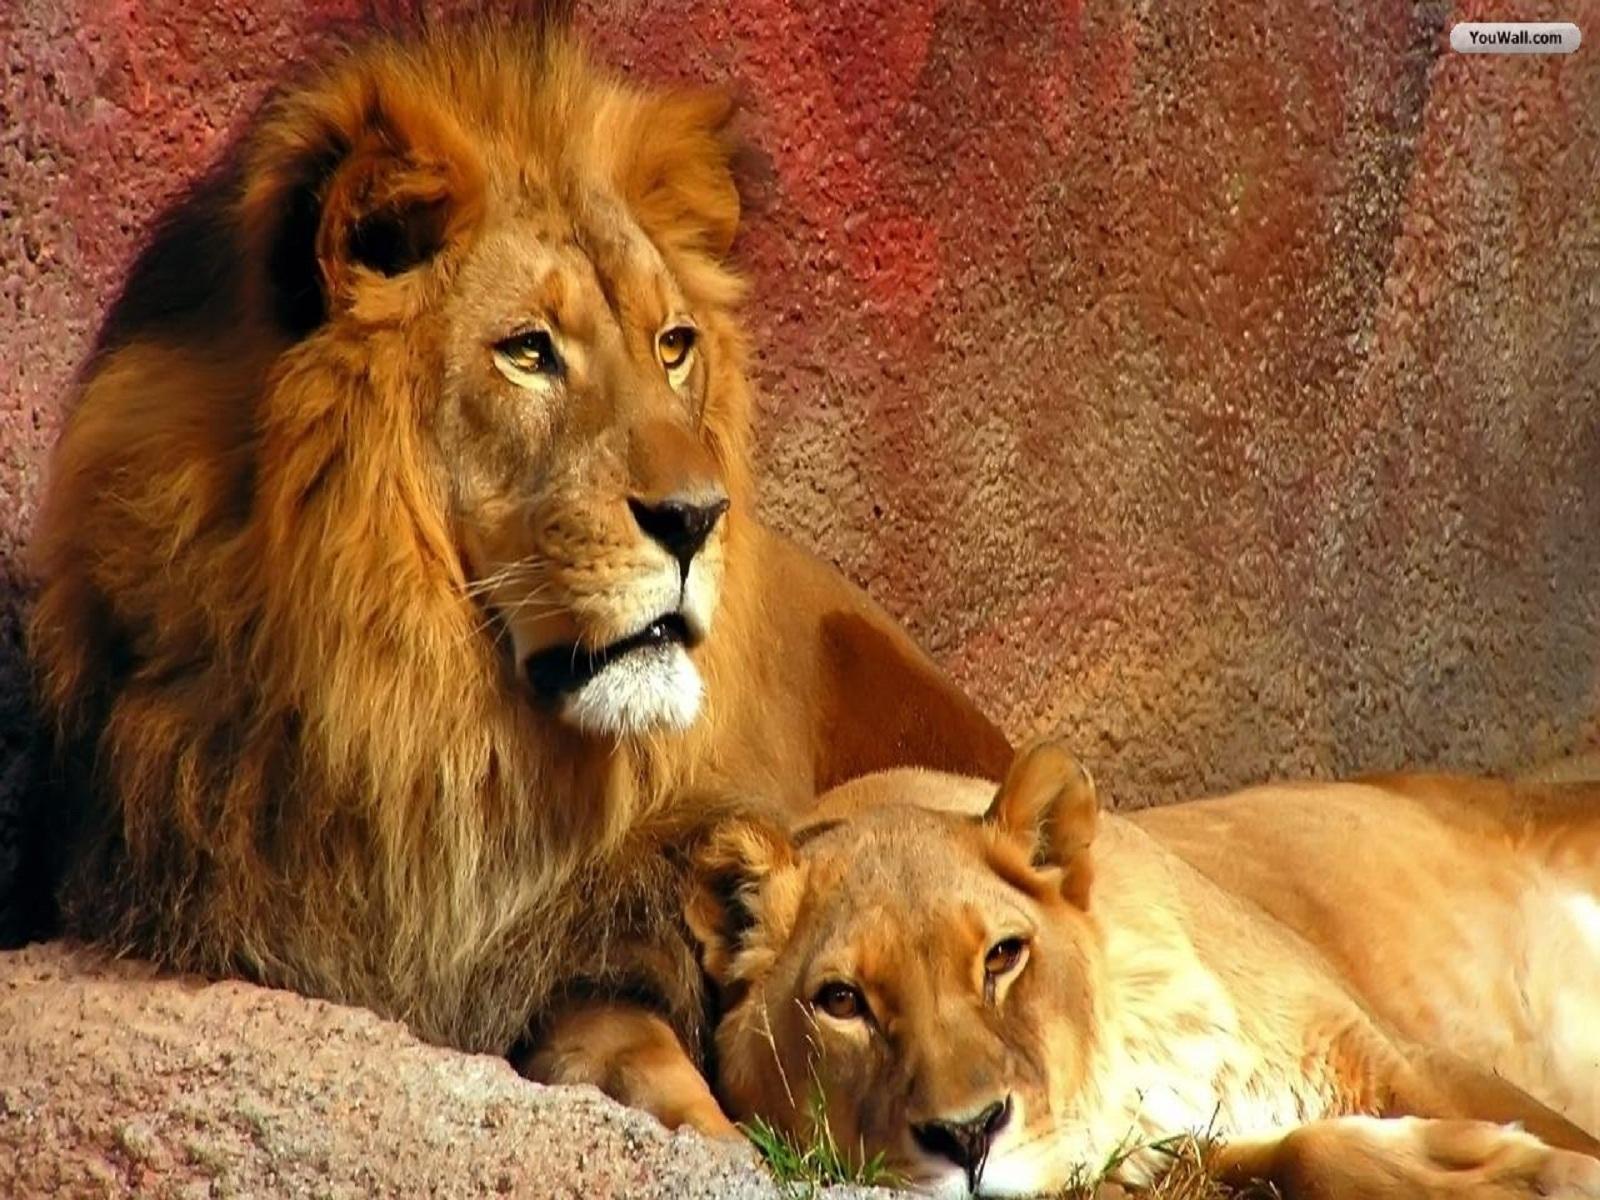 Lion Wallpaper Pack